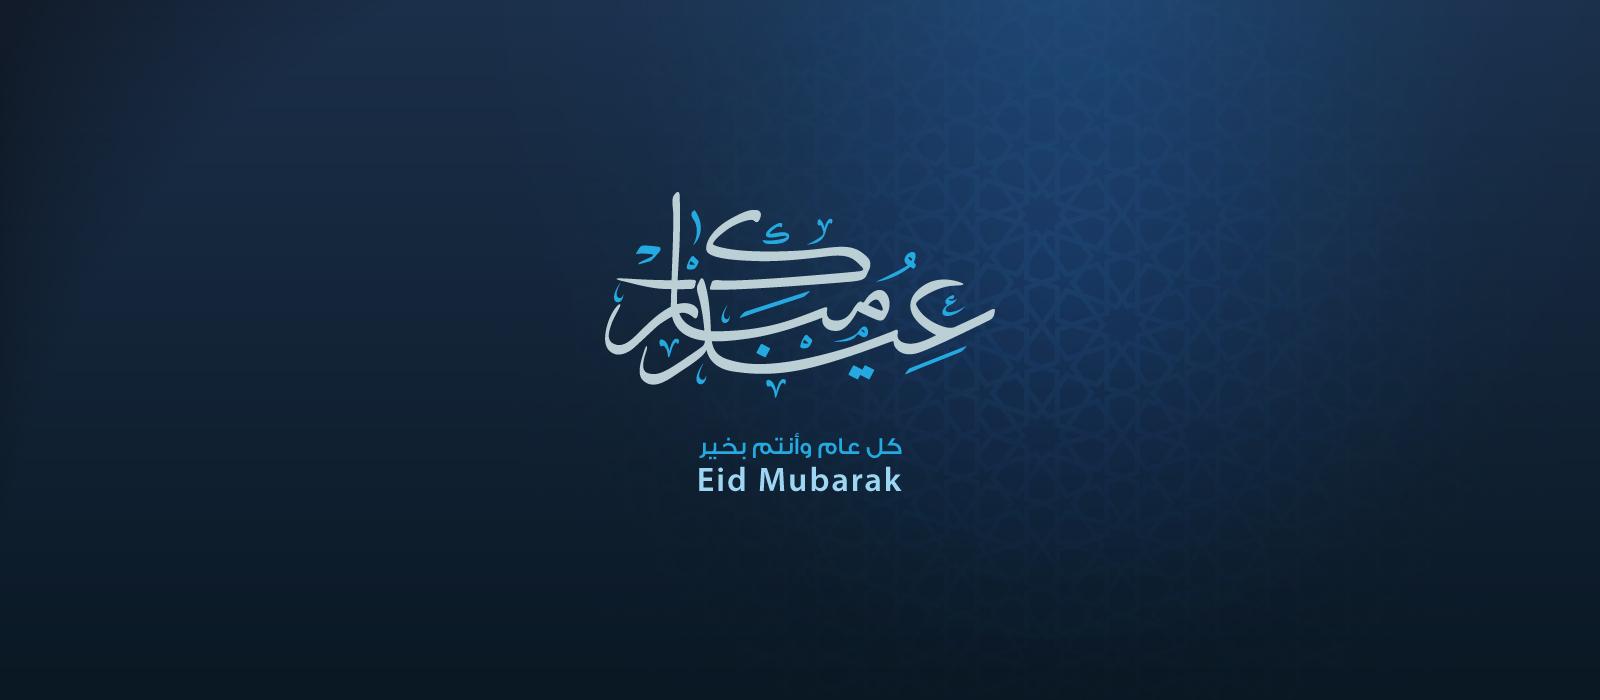 Eid Mubarak Website-Banner-1600x700